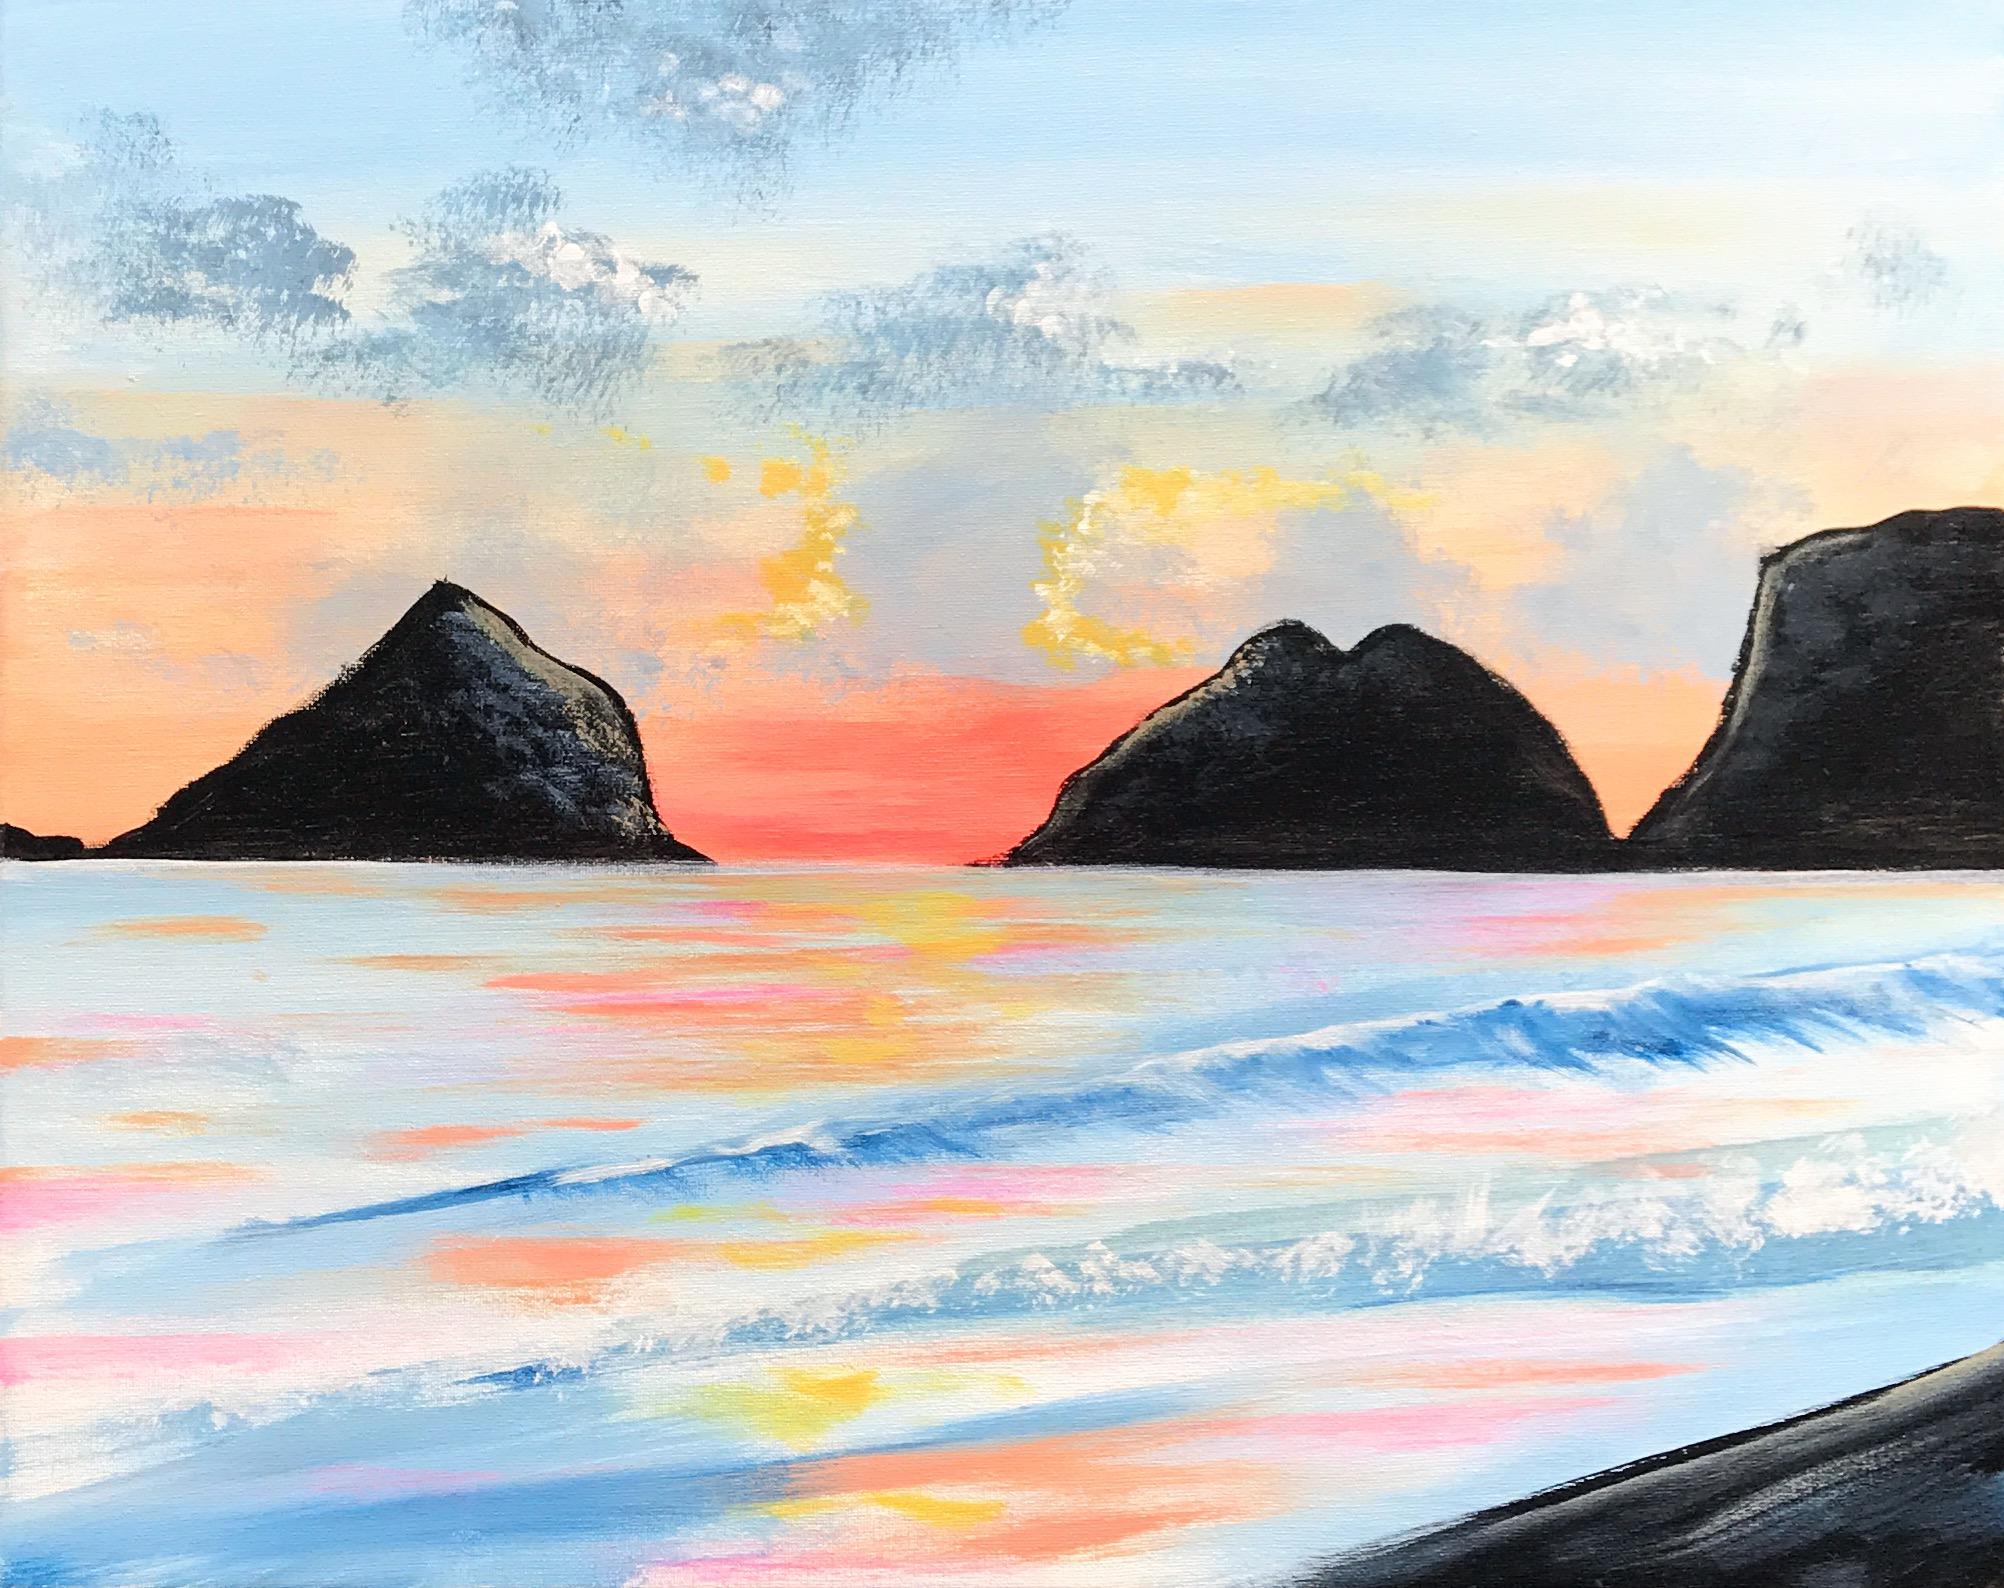 Oceanside | The Loaded Brush Paint & Sip Classes | loadedbrushpdx.com